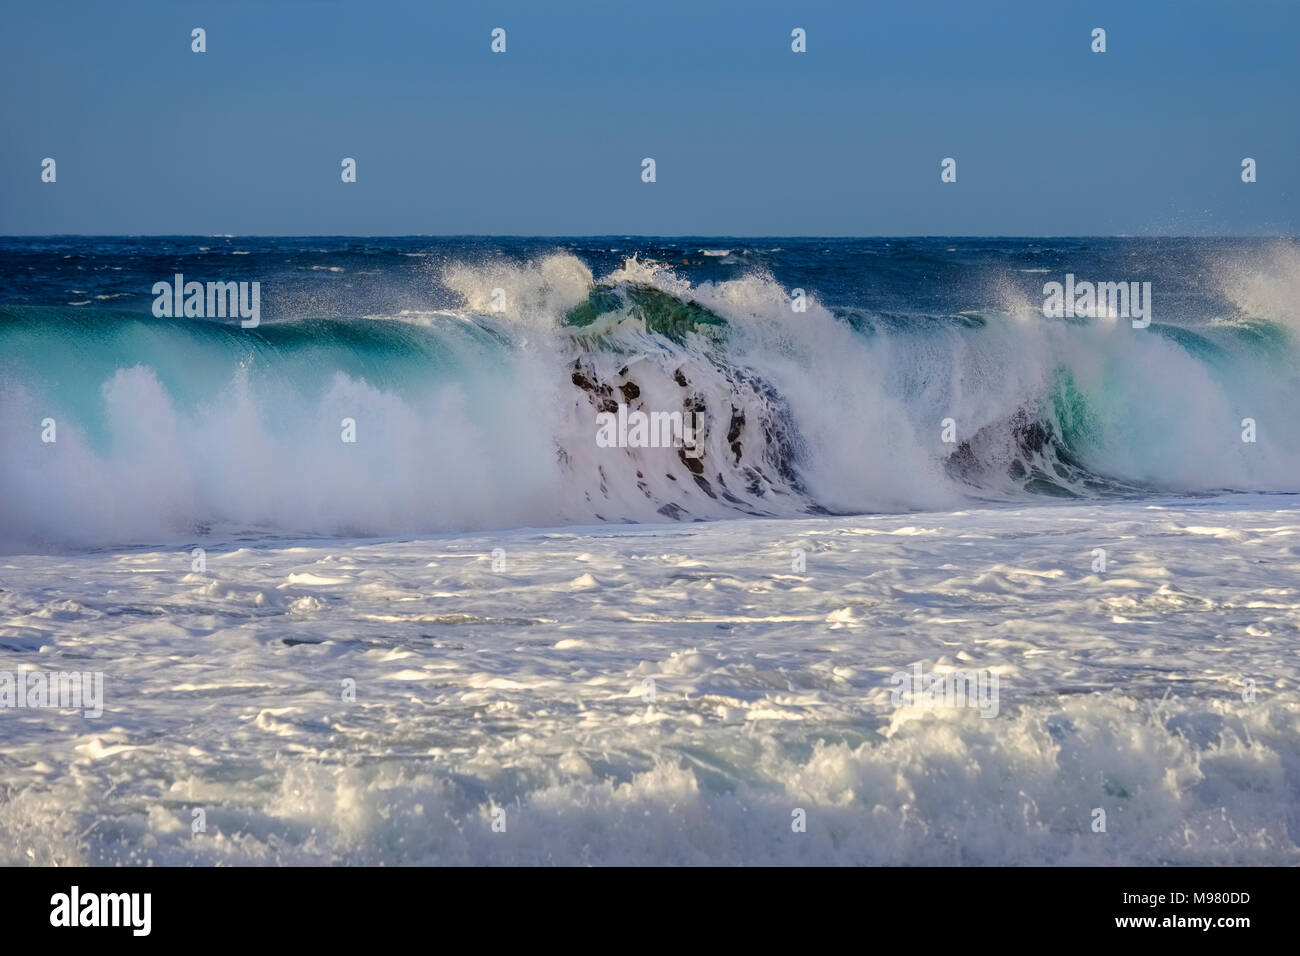 Welle in Sandbaai, Atlantik, Playa del Ingles, Valle Gran Rey, La Gomera, Kanarische Inseln, Spanien Stockbild